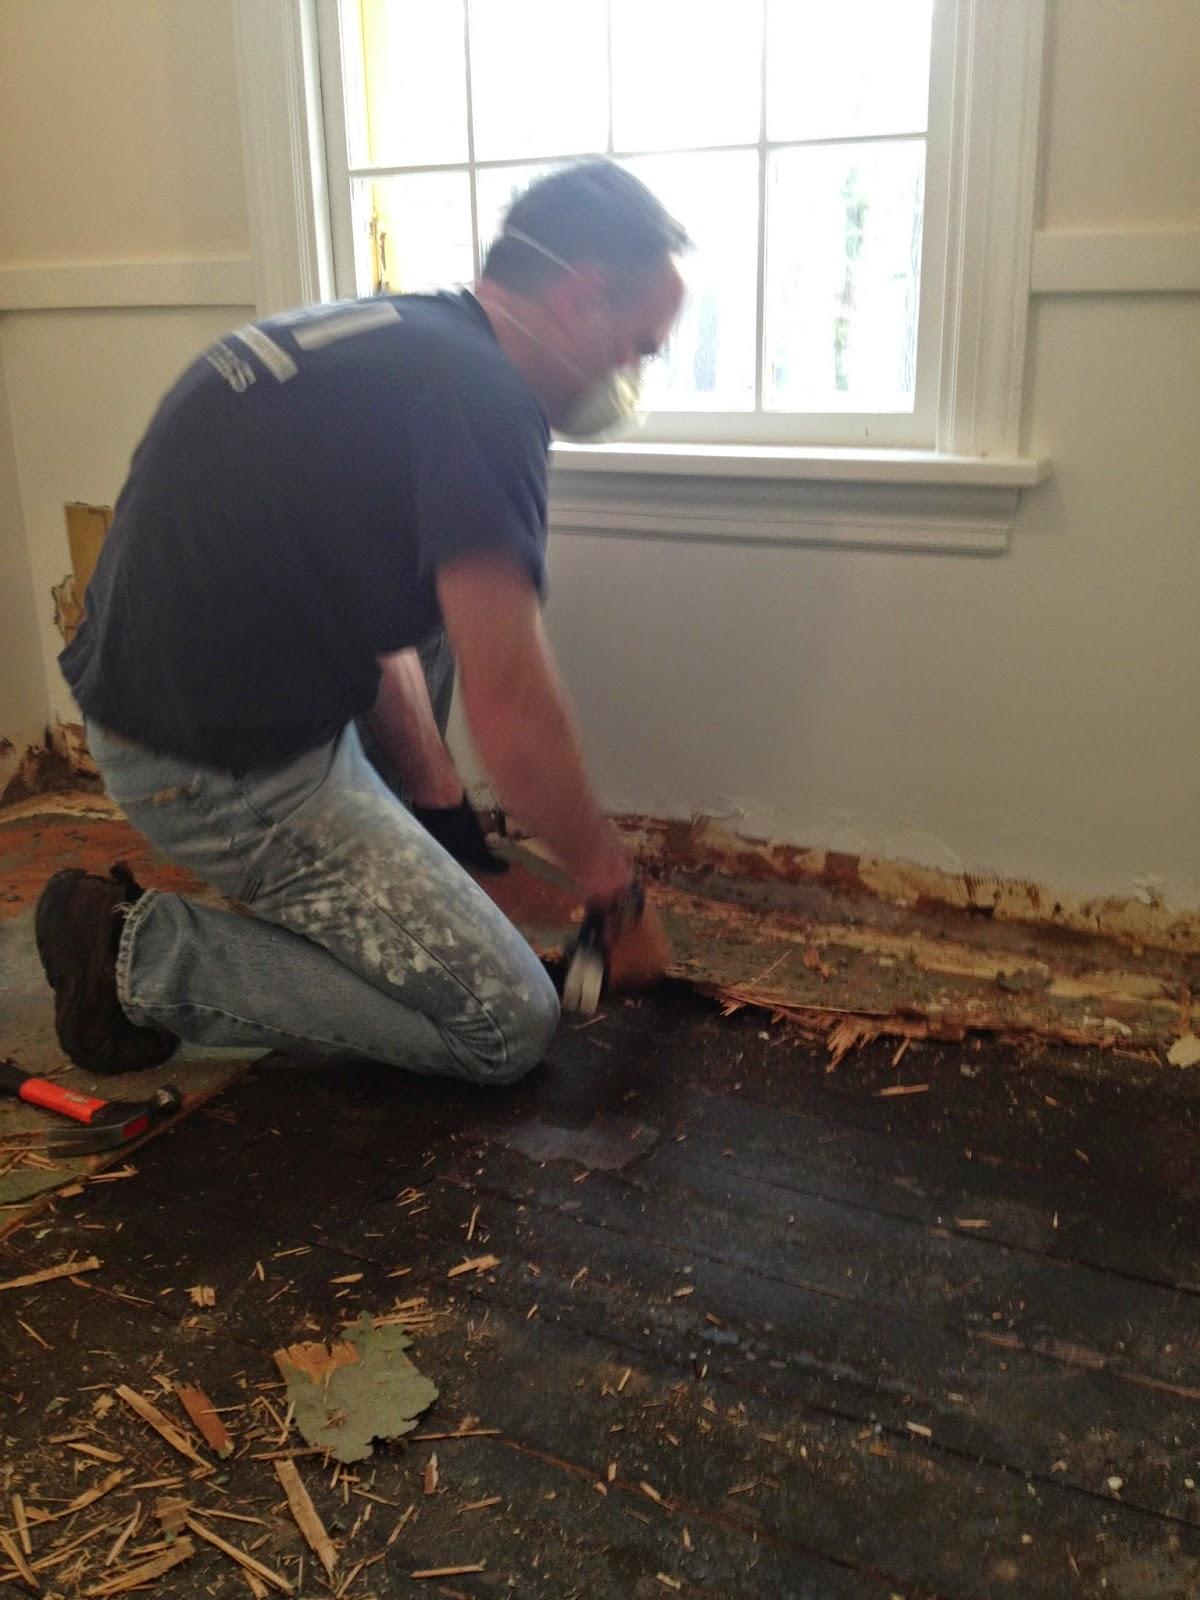 removing linoleum floors - How to restore wood floors